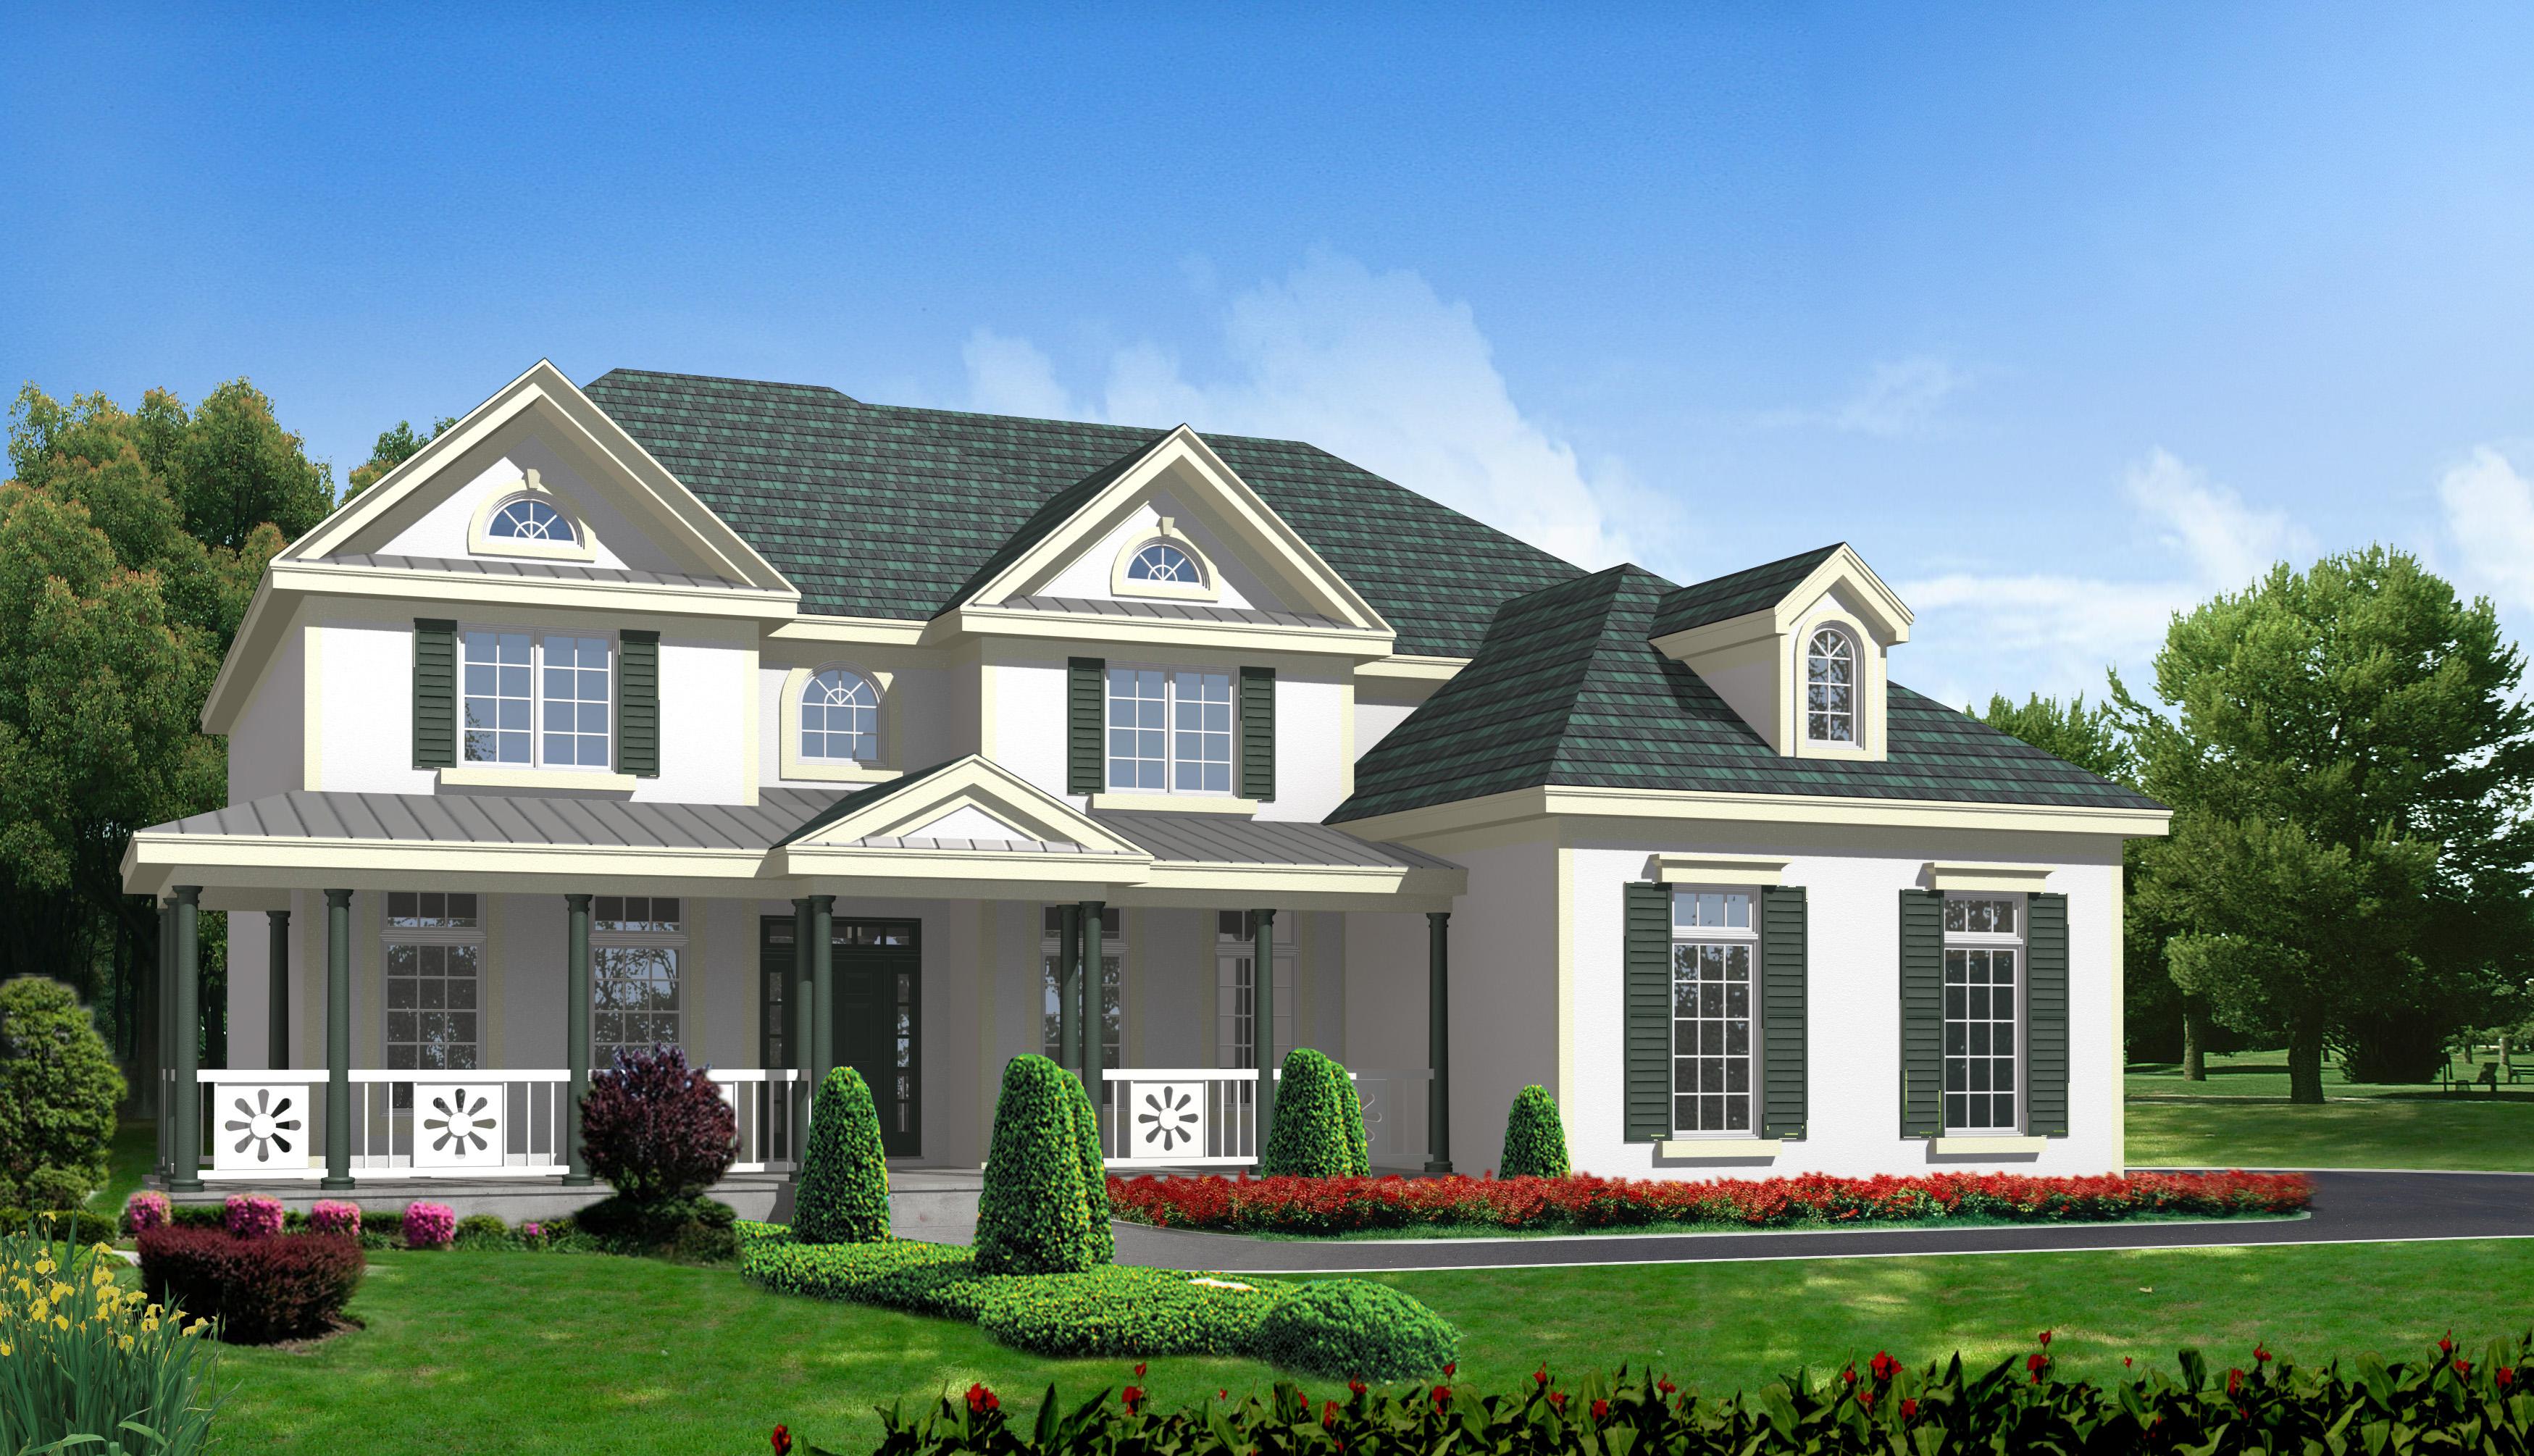 18551wb architectural designs house plans for Architectural designs com